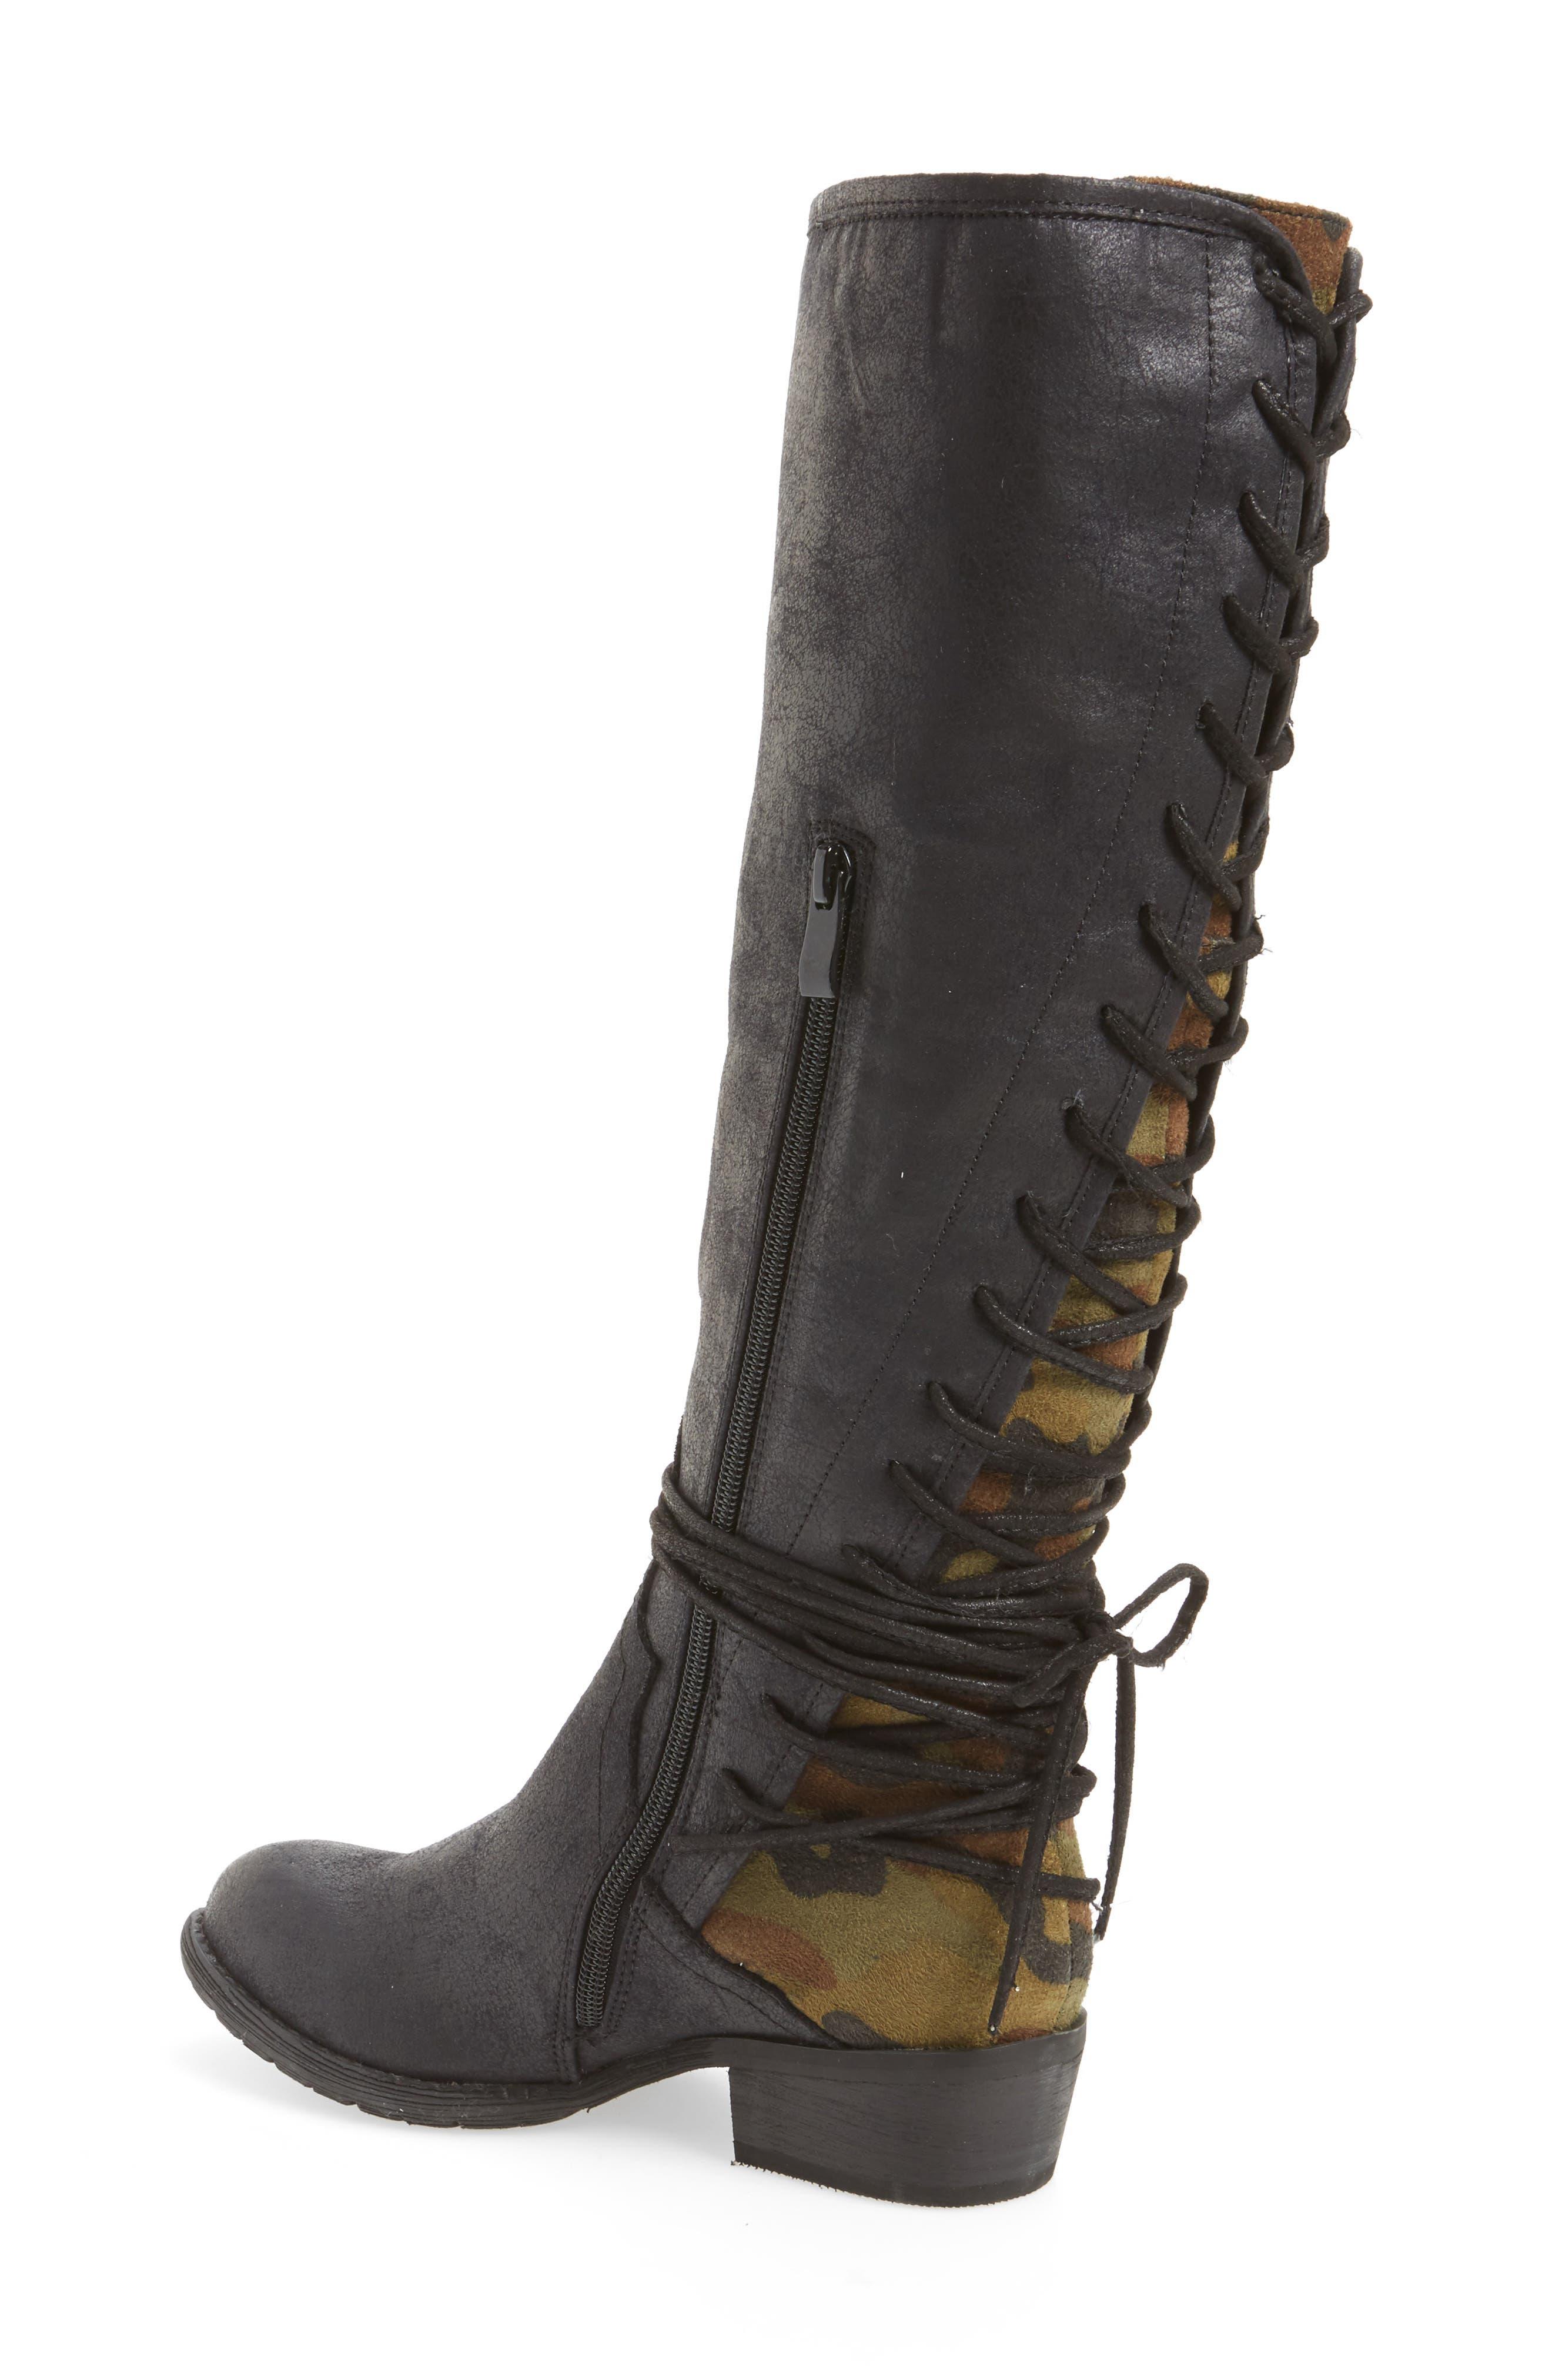 Alternate Image 2  - Very Volatile Marcel Corseted Knee High Boot (Women)